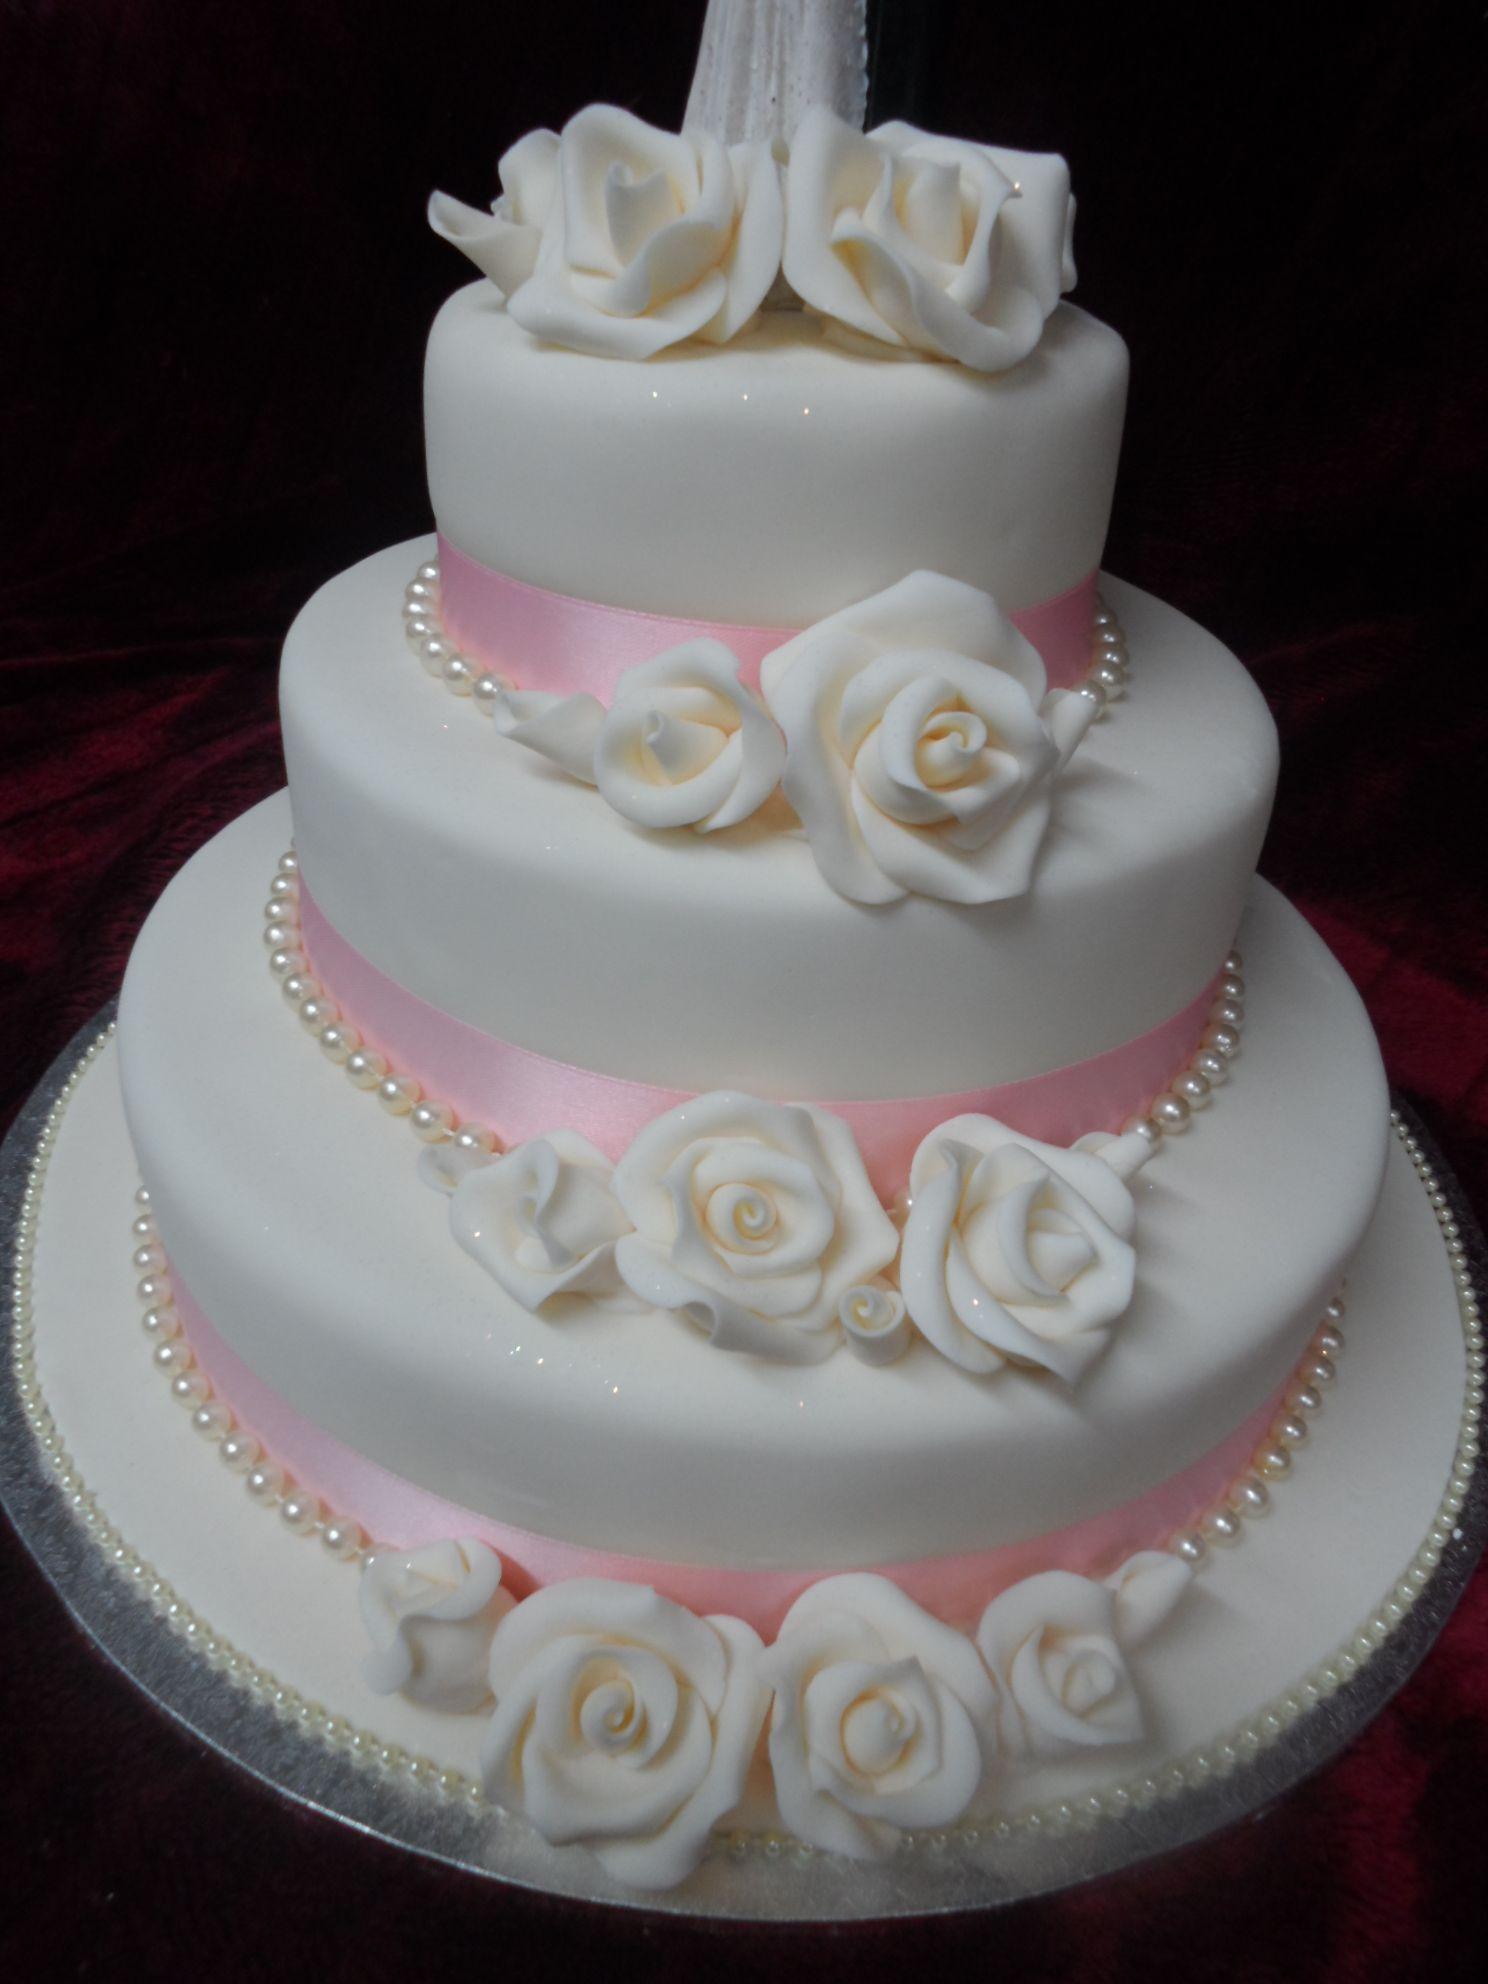 3 tier Round Rose themed wedding cake frescowoosh.co.nz